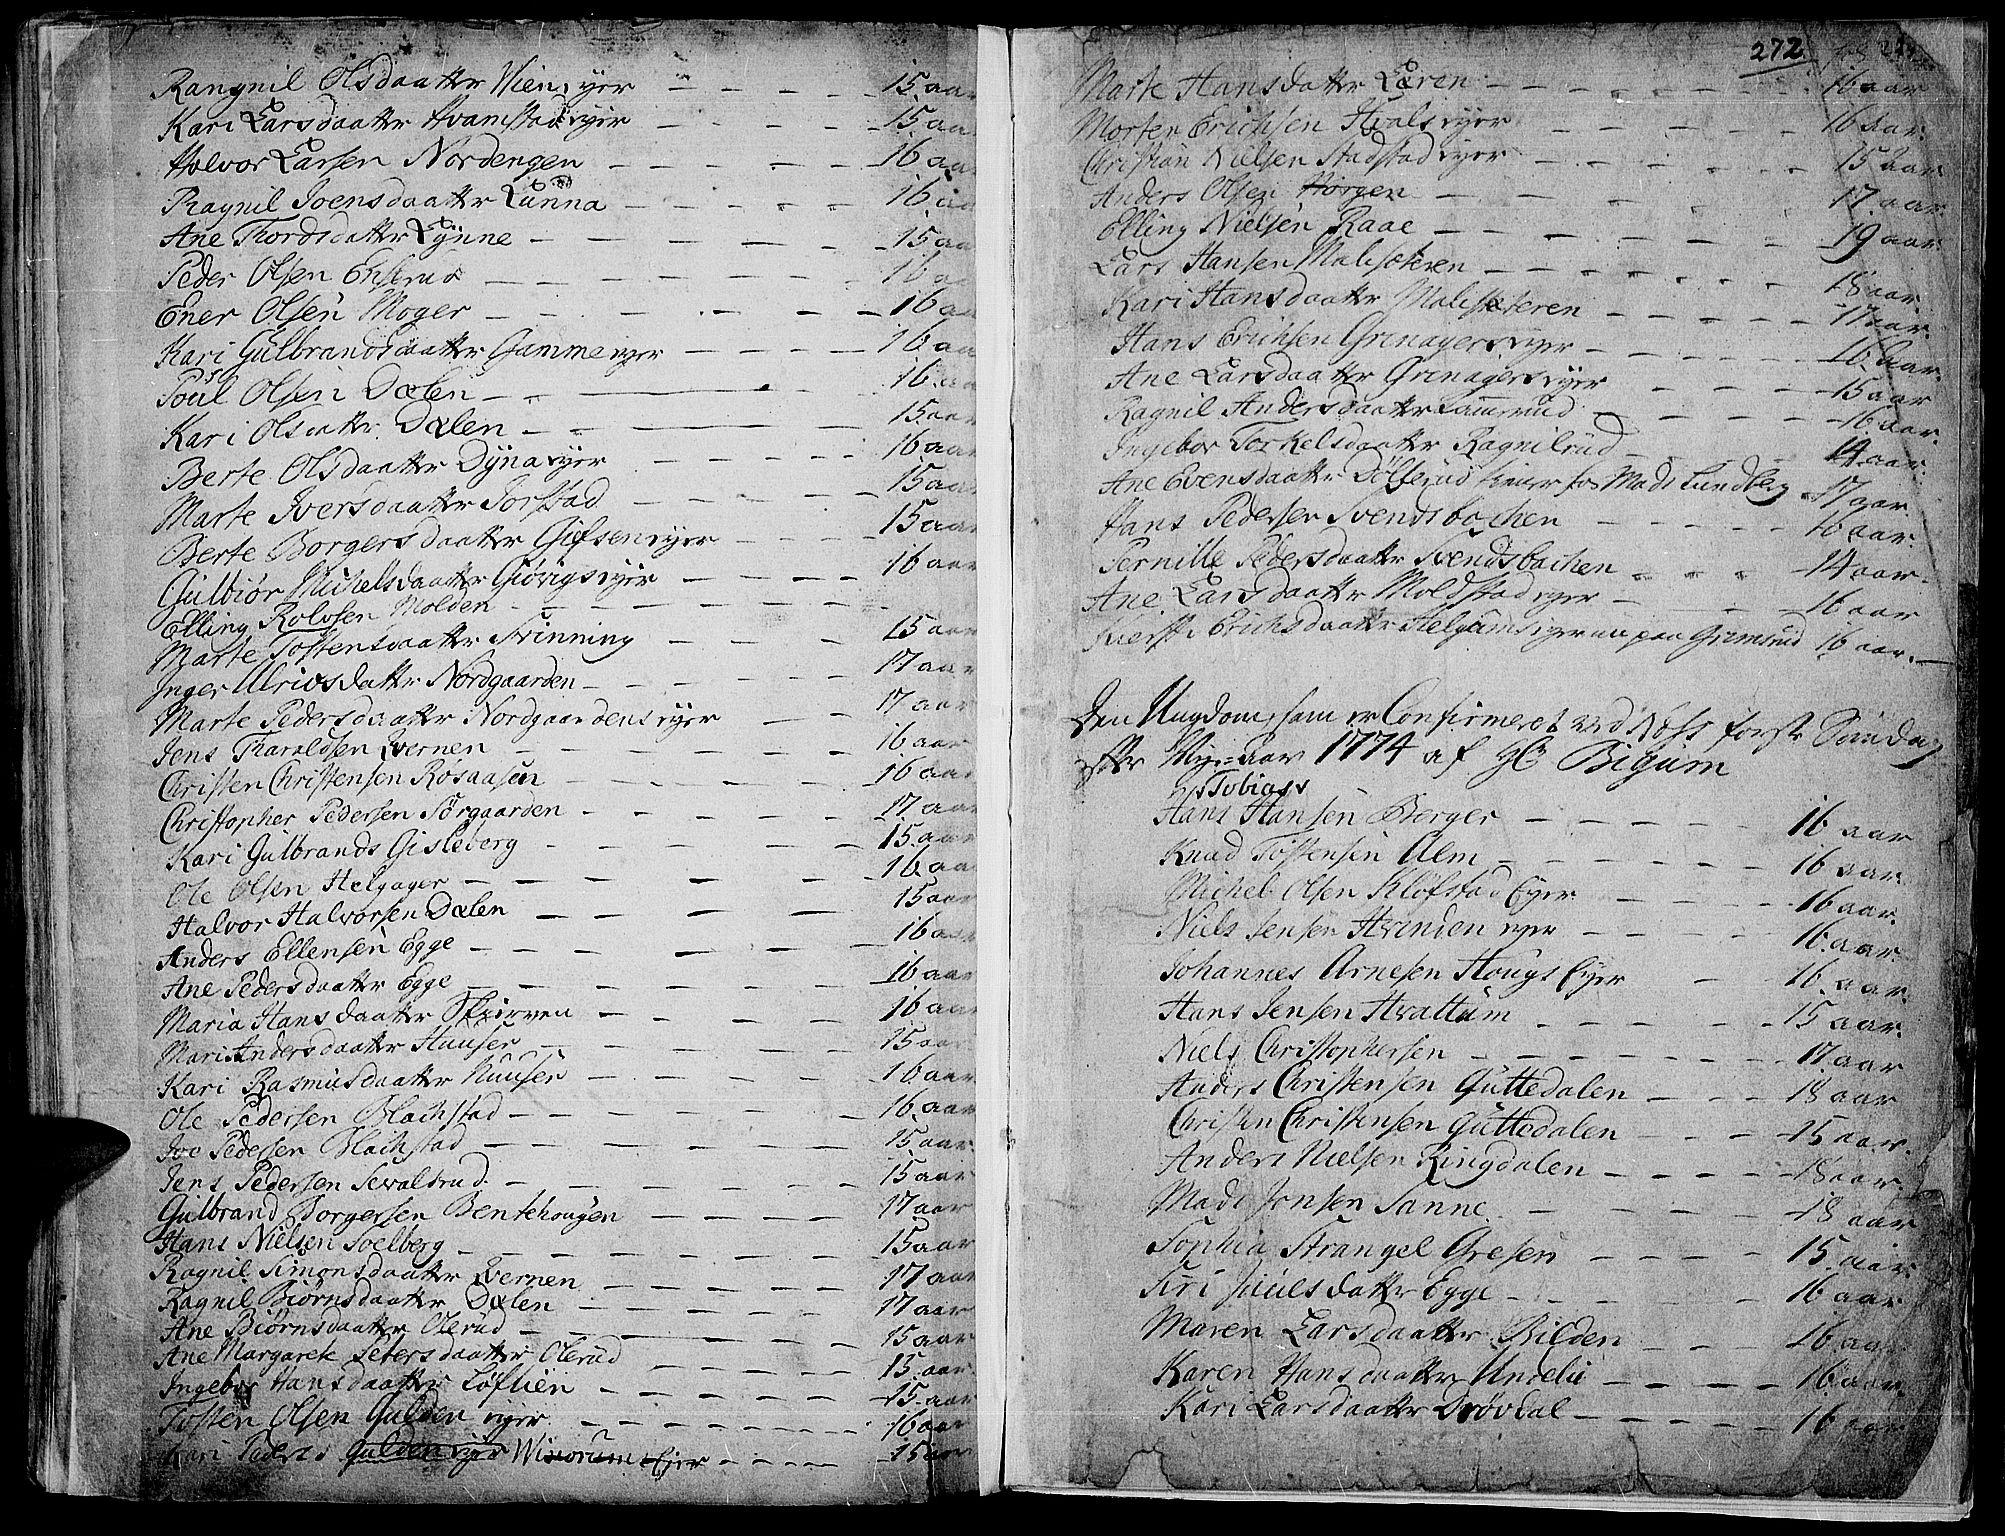 SAH, Gran prestekontor, Ministerialbok nr. 4, 1759-1775, s. 272